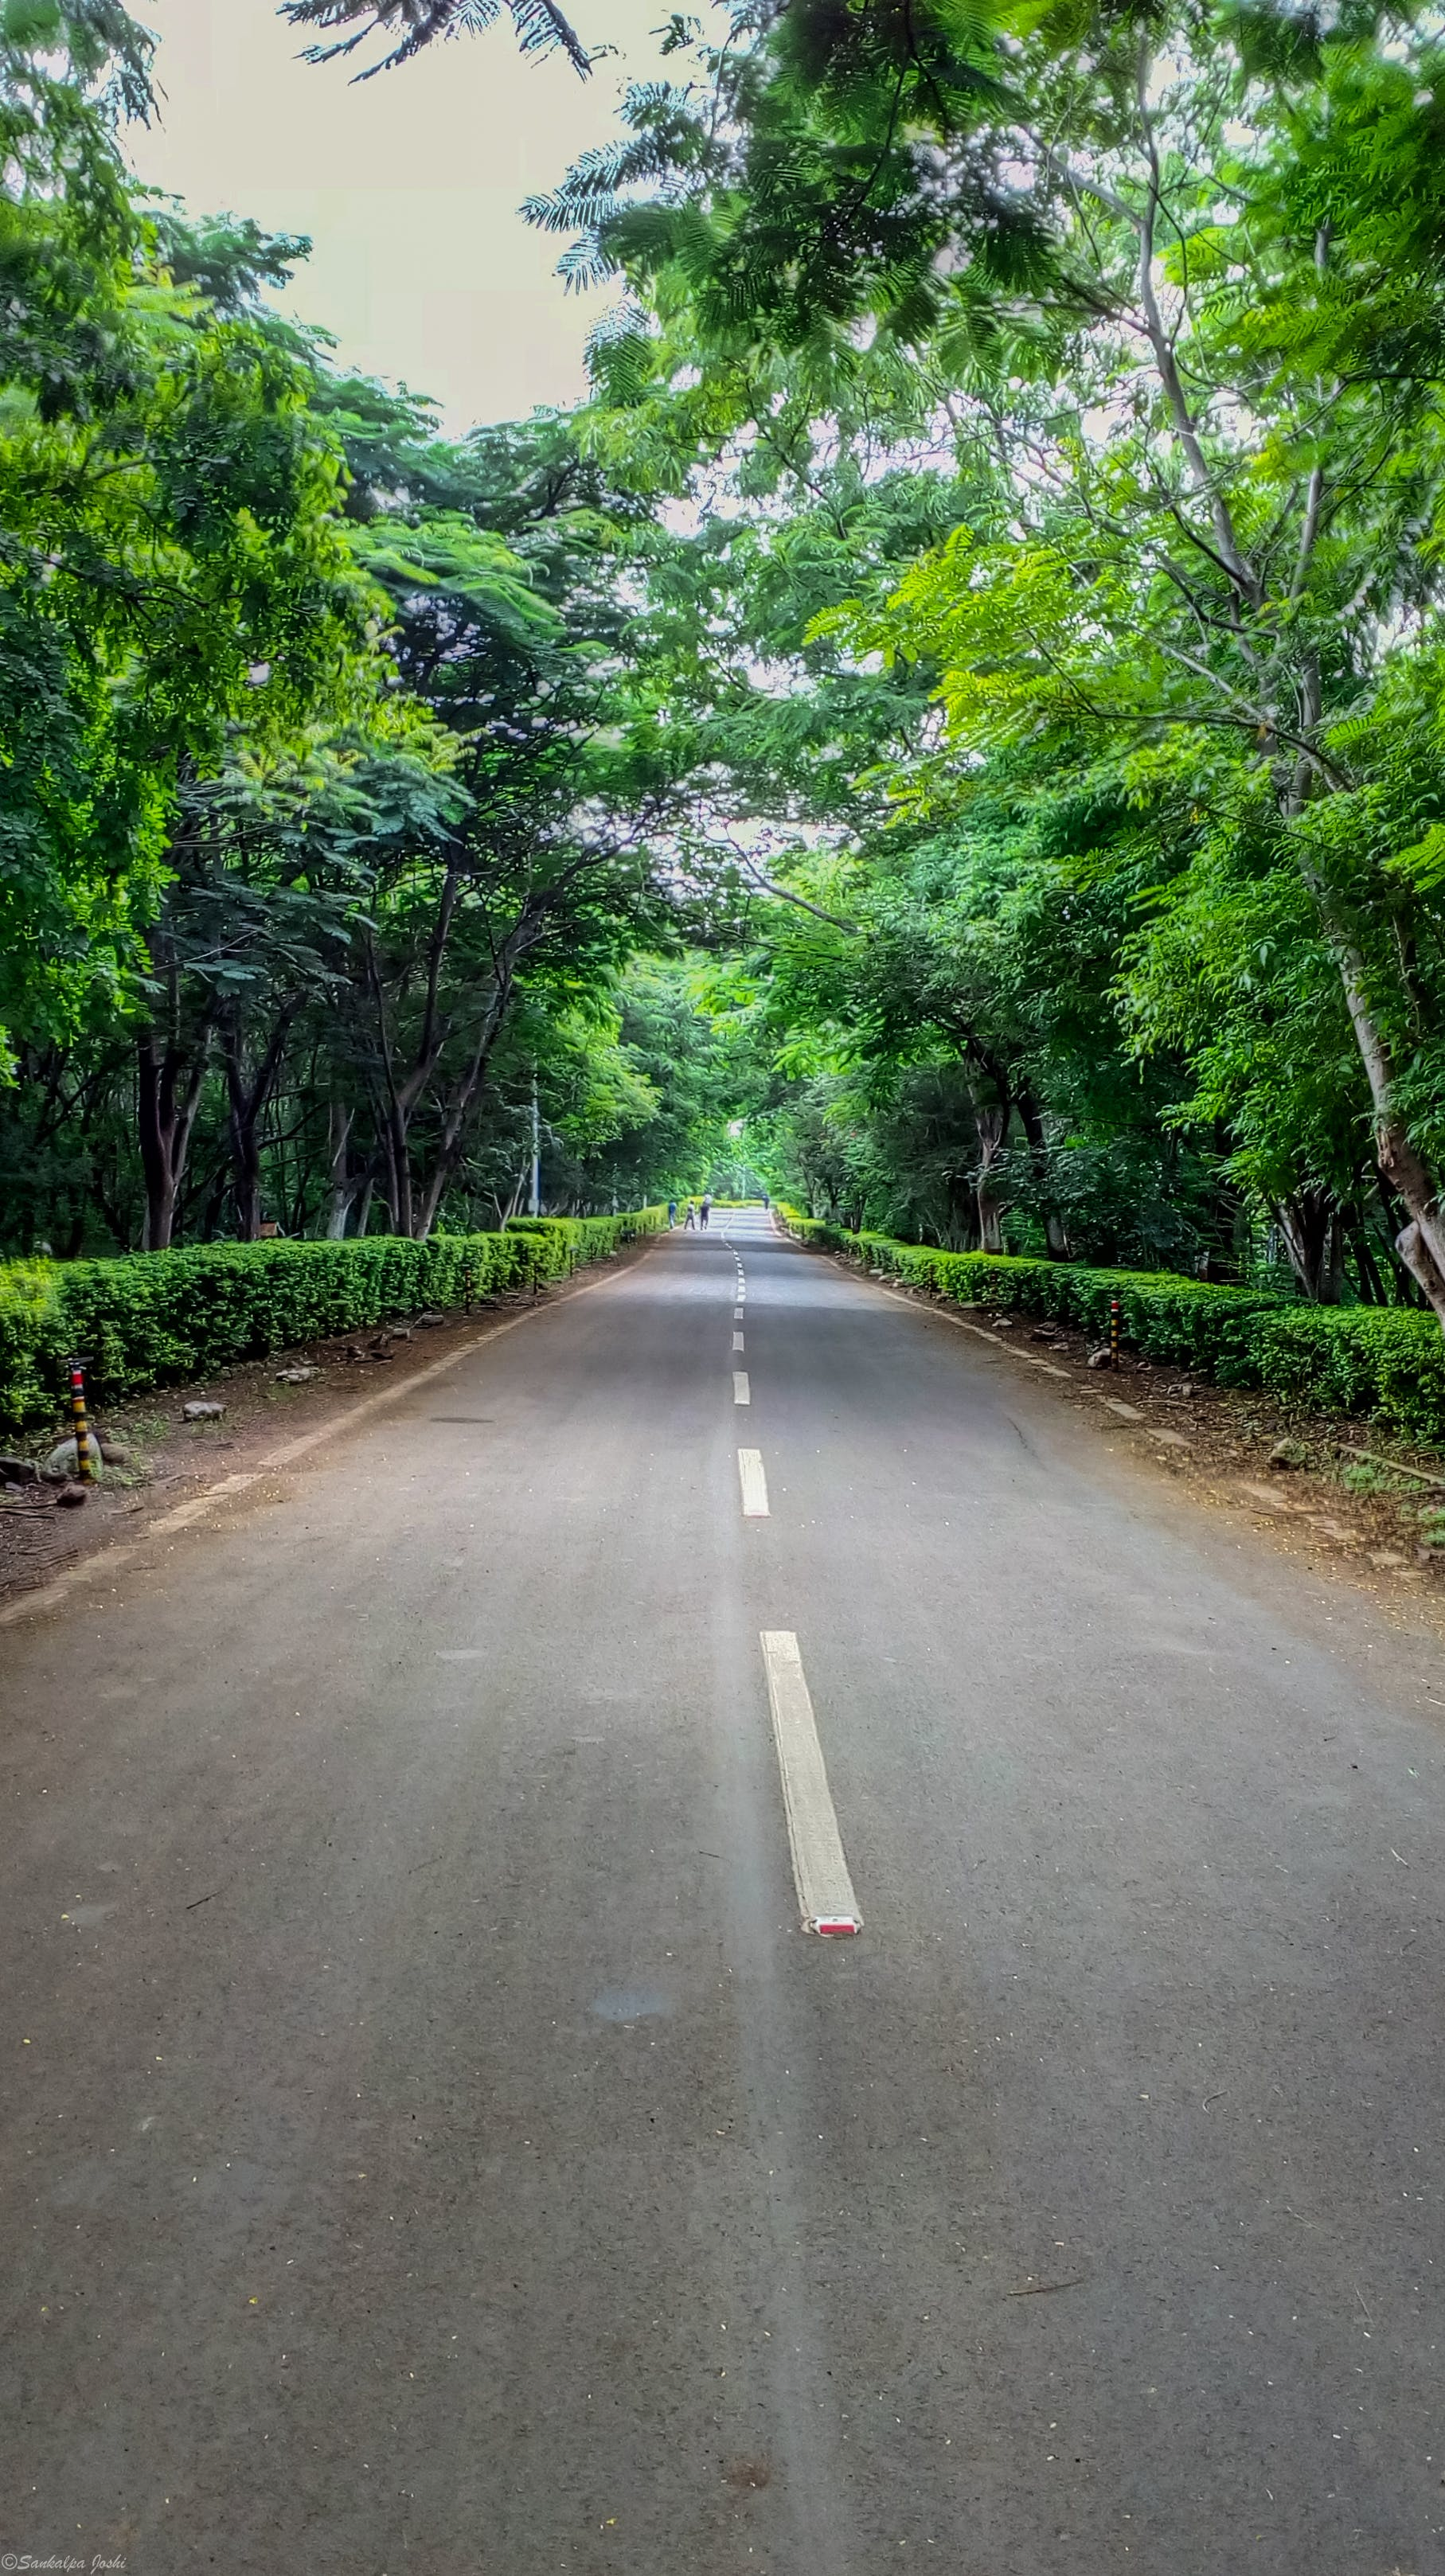 Fotos de stock gratuitas de bosque, fotografía de naturaleza, India, largo camino